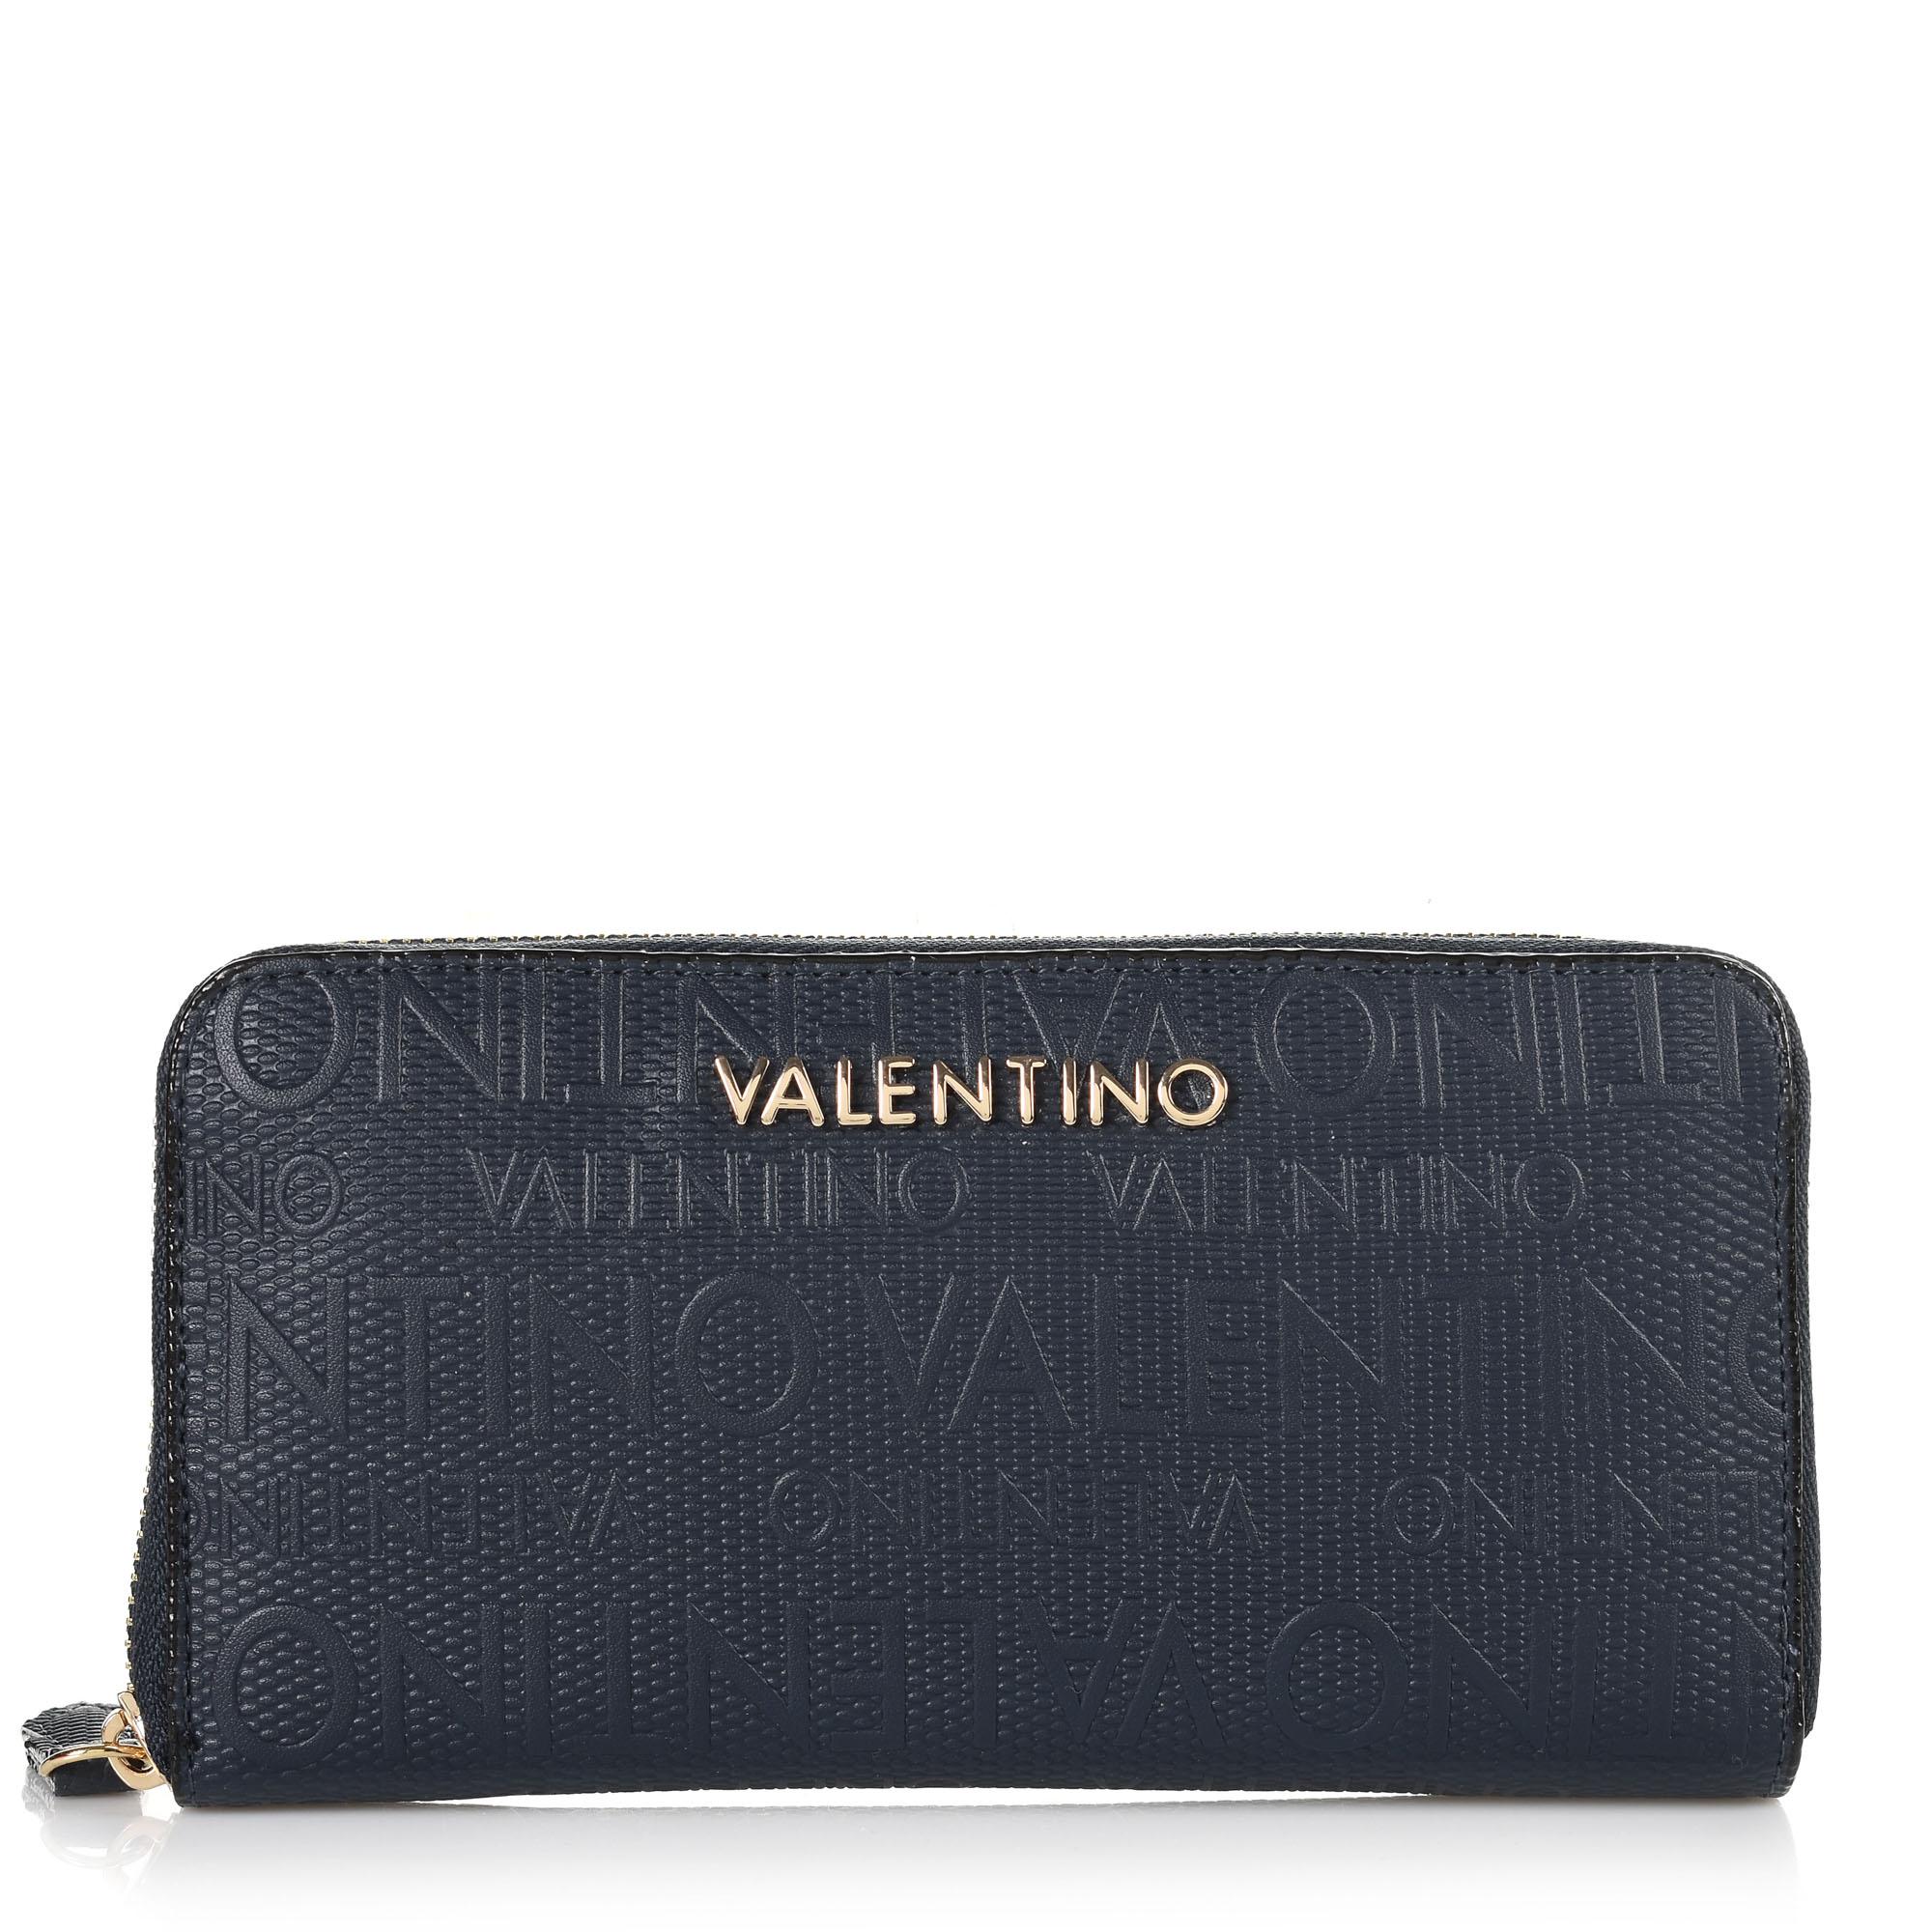 56ab23db61 Brand Bags Πορτοφόλι Κασετίνα Valentino Dorry VPS2YC155